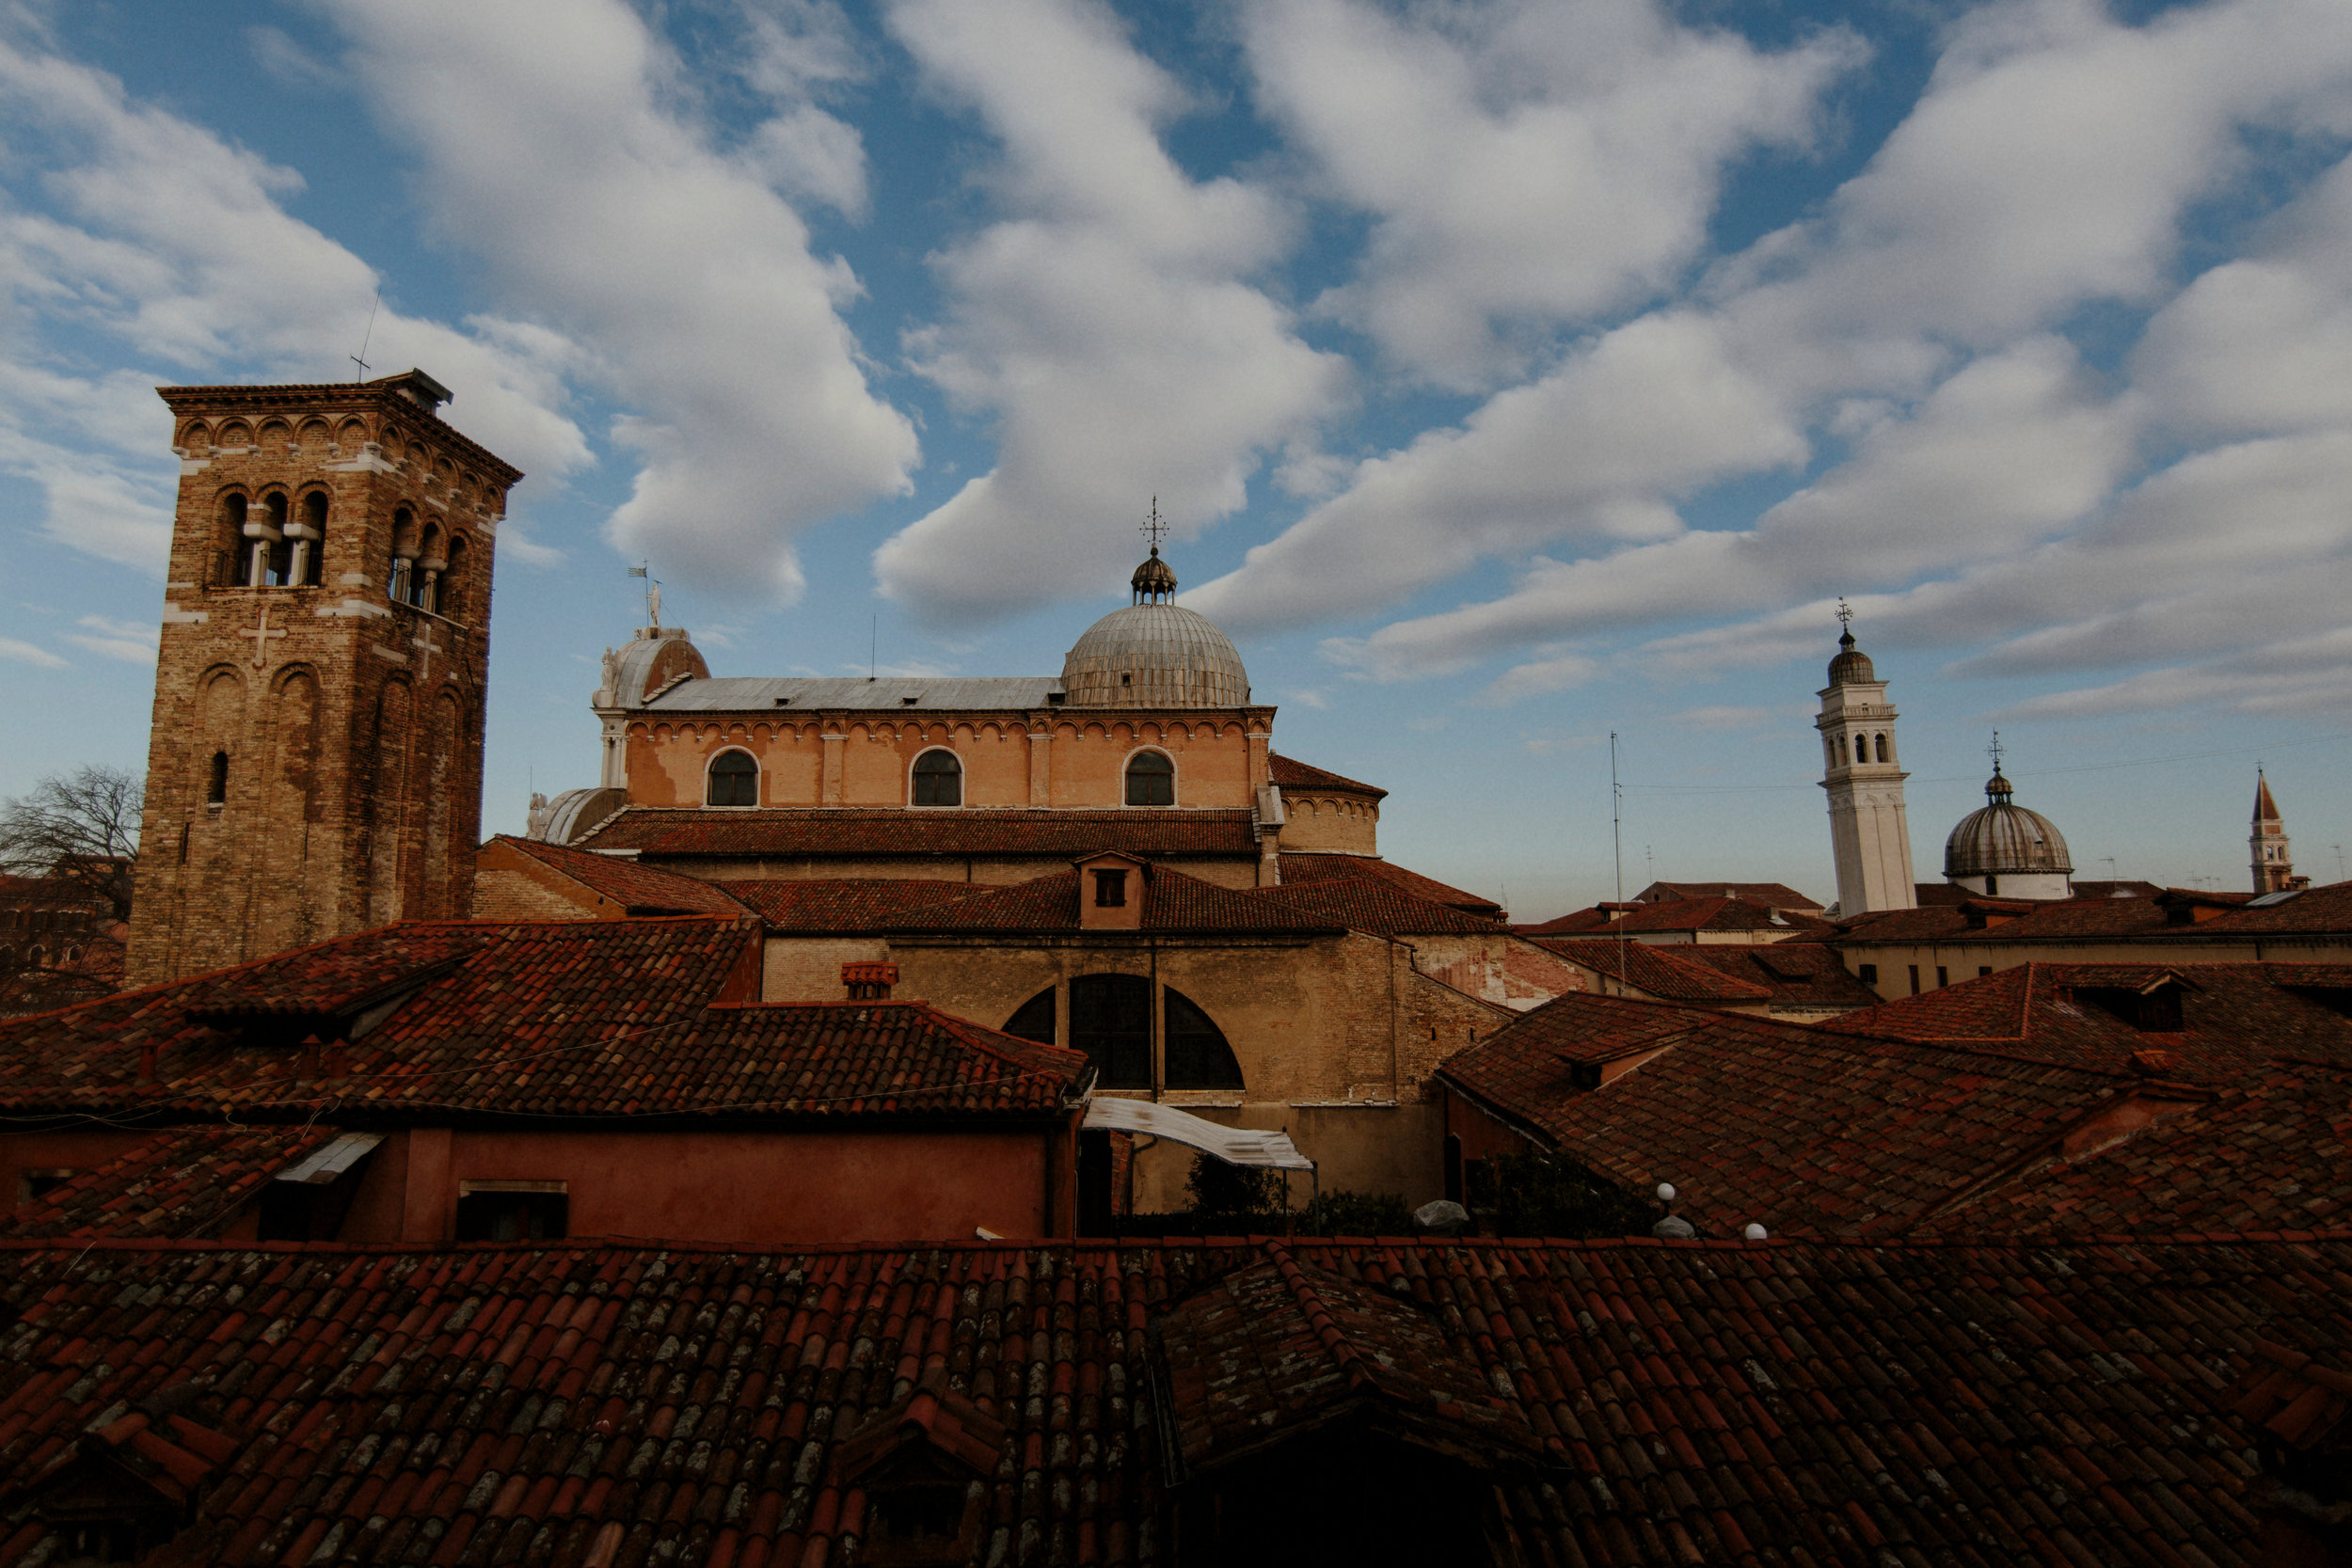 Italy Happily Shavers Website-3Italy Happily Shavers Website Grain.jpg